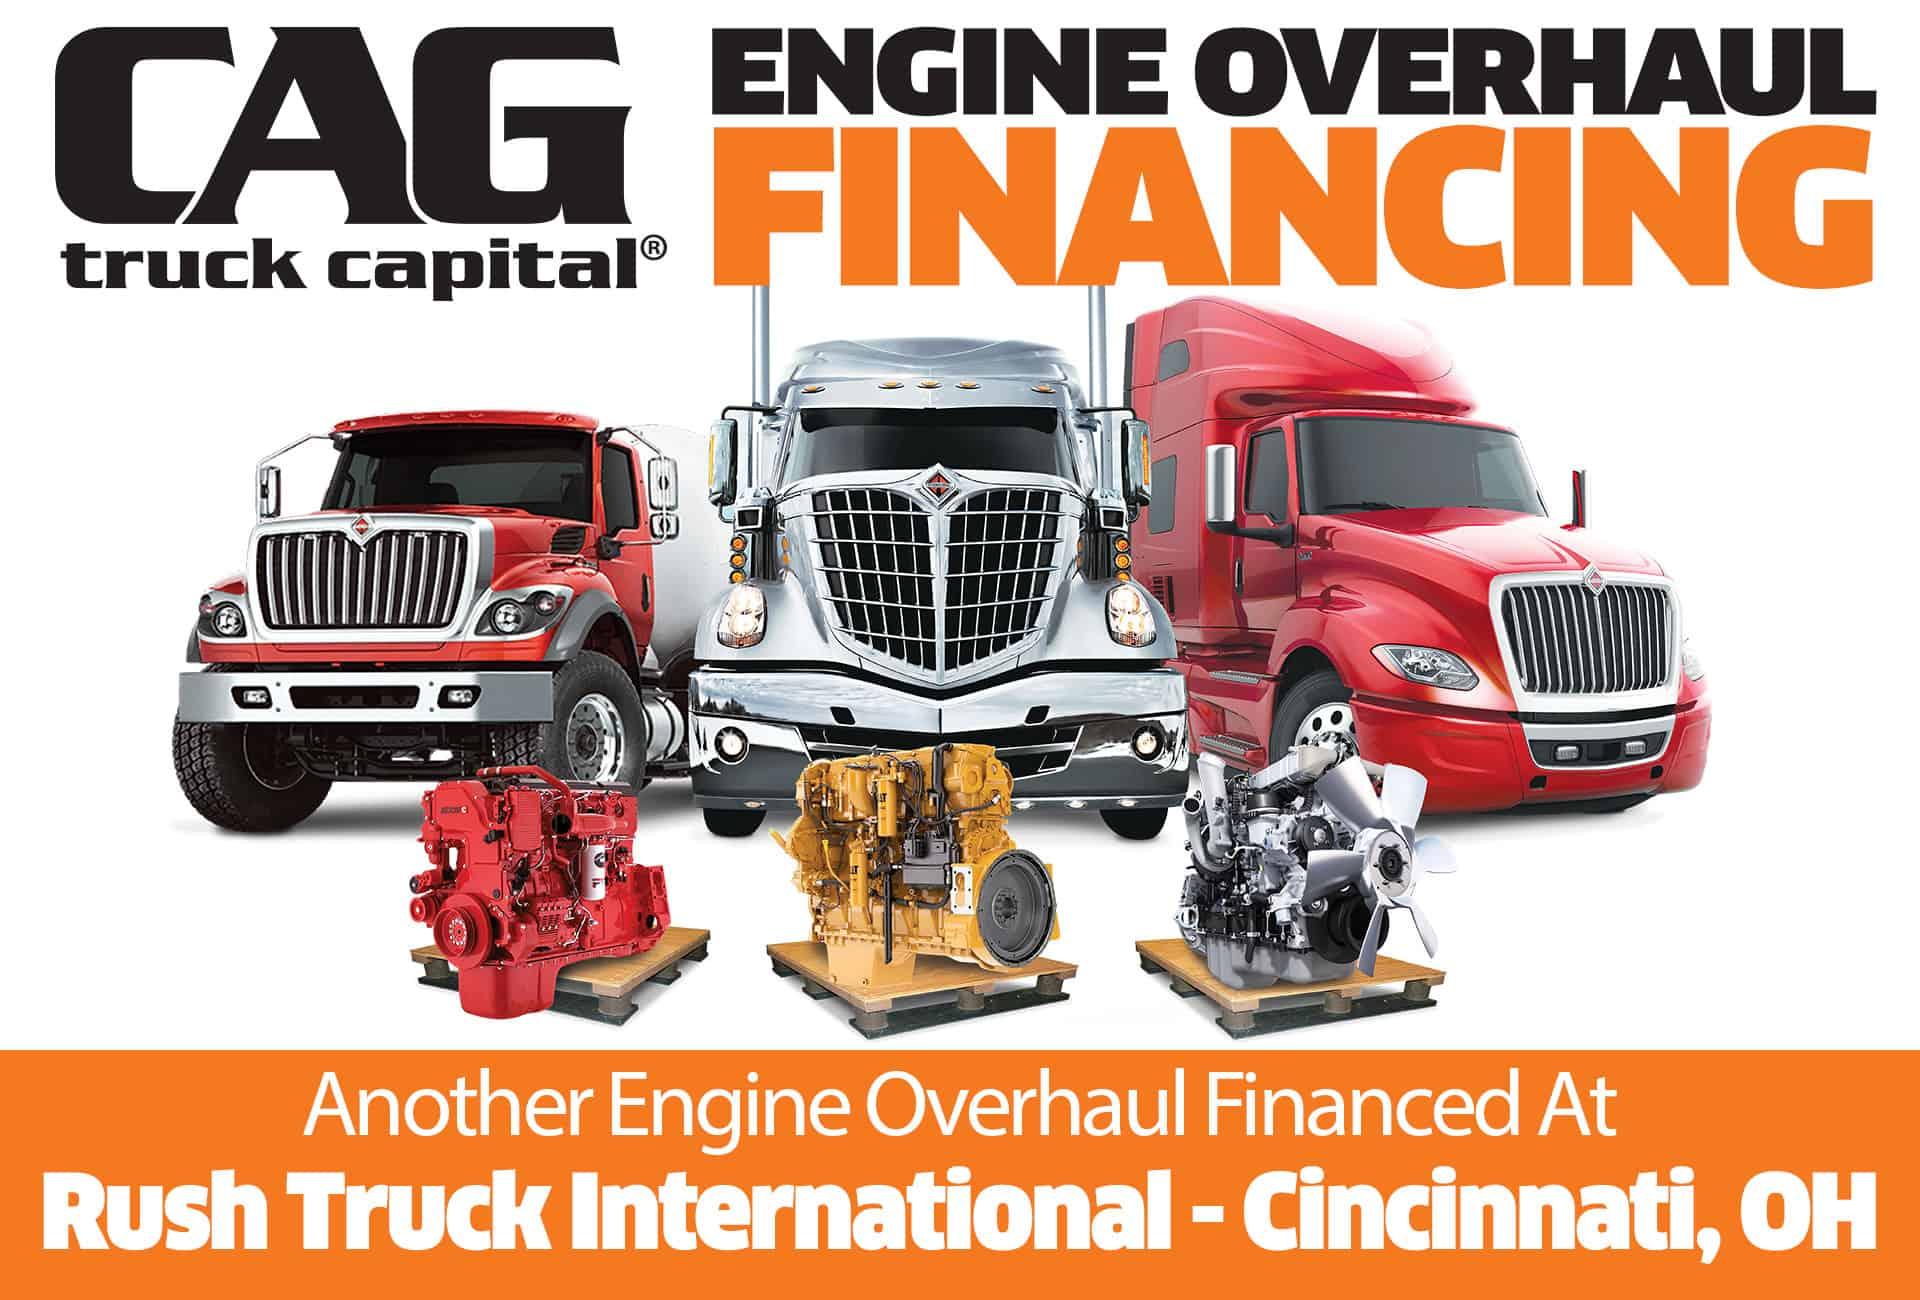 Rush International Engine Overhaul Financing Cincinnati OH